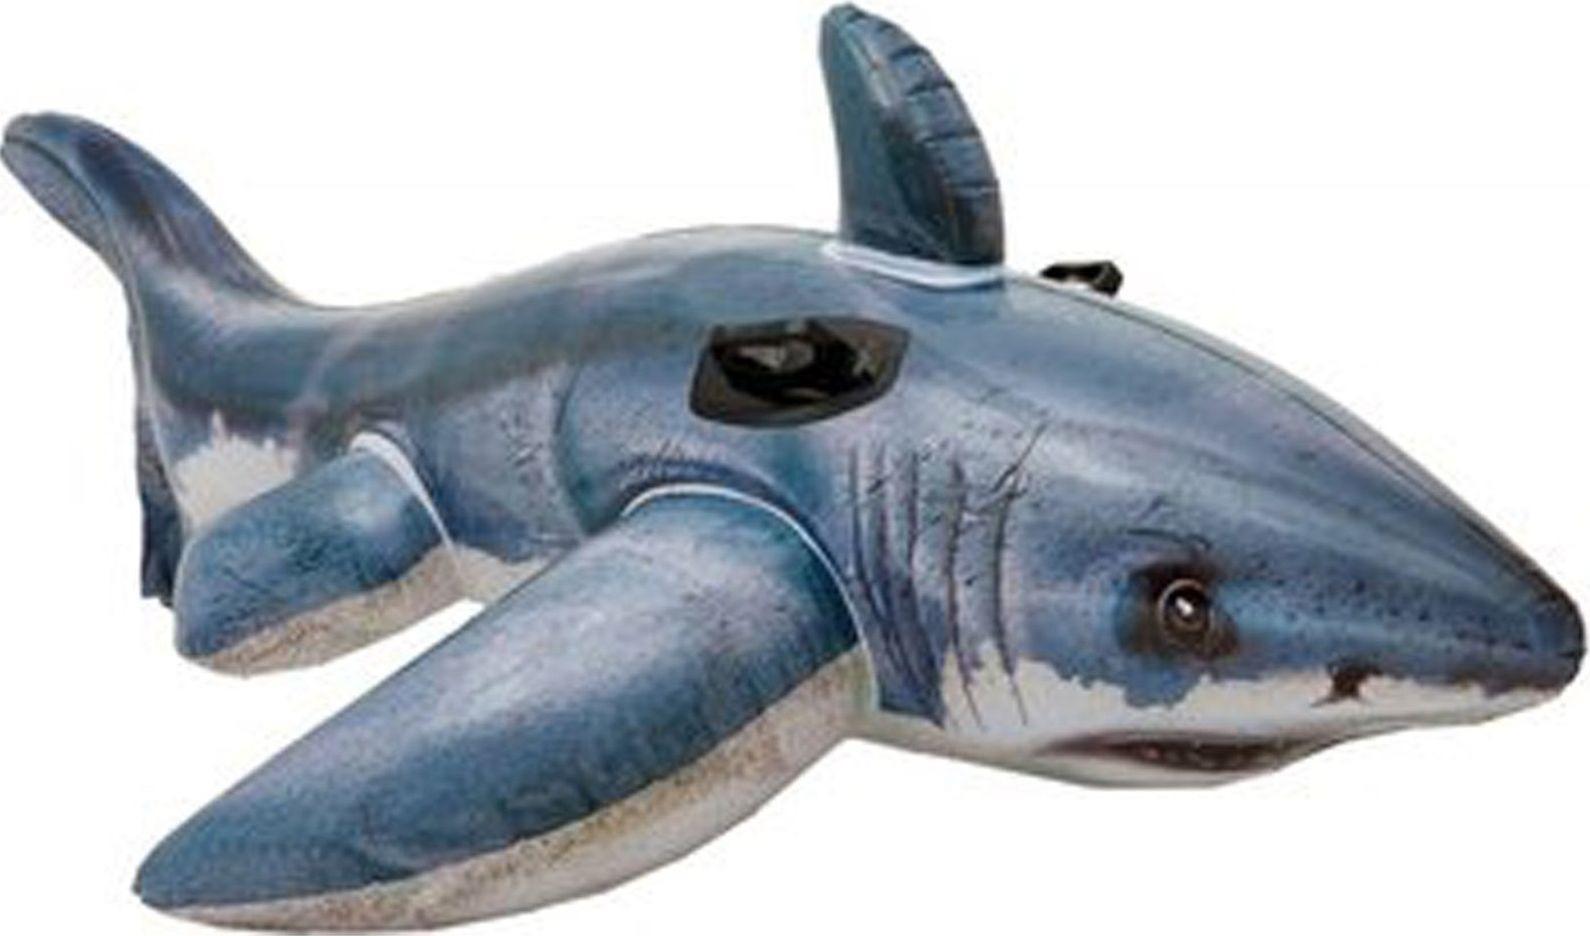 Надувная игрушка-наездник Intex Акула, 57525NP, от 6 лет, 173 х 107 см надувная игрушка наездник intex краб 213х137см 57528